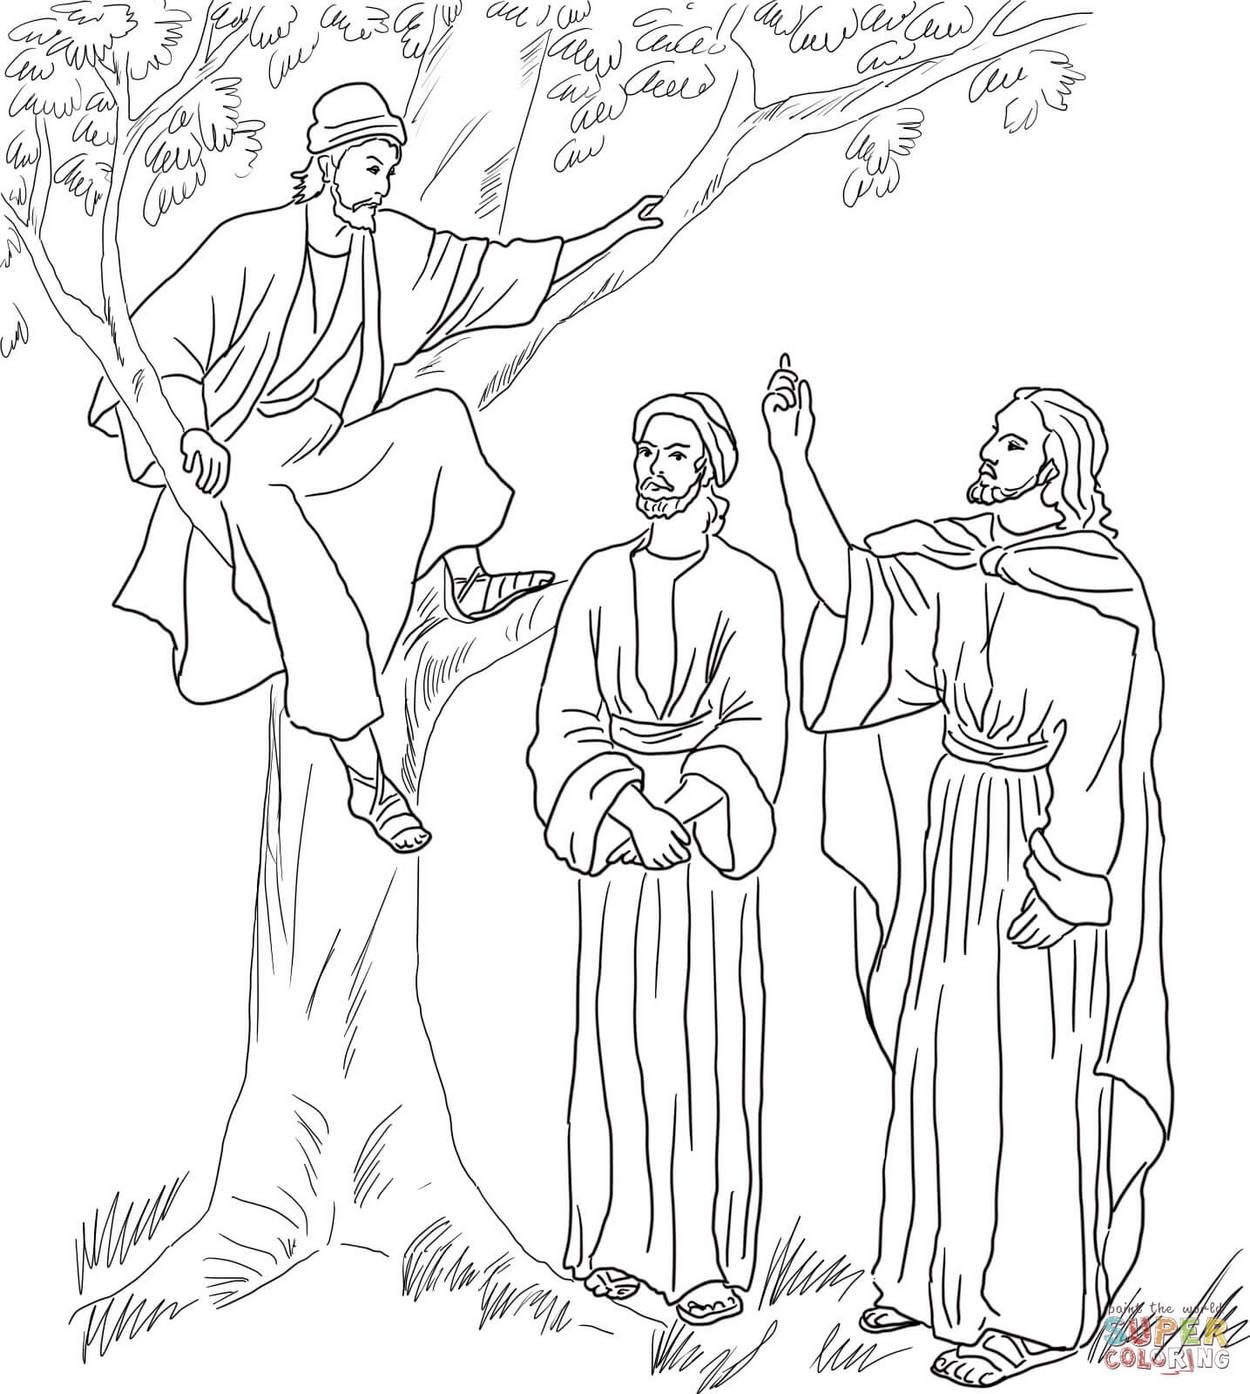 zacchaeus-tree-coloring-page-printable